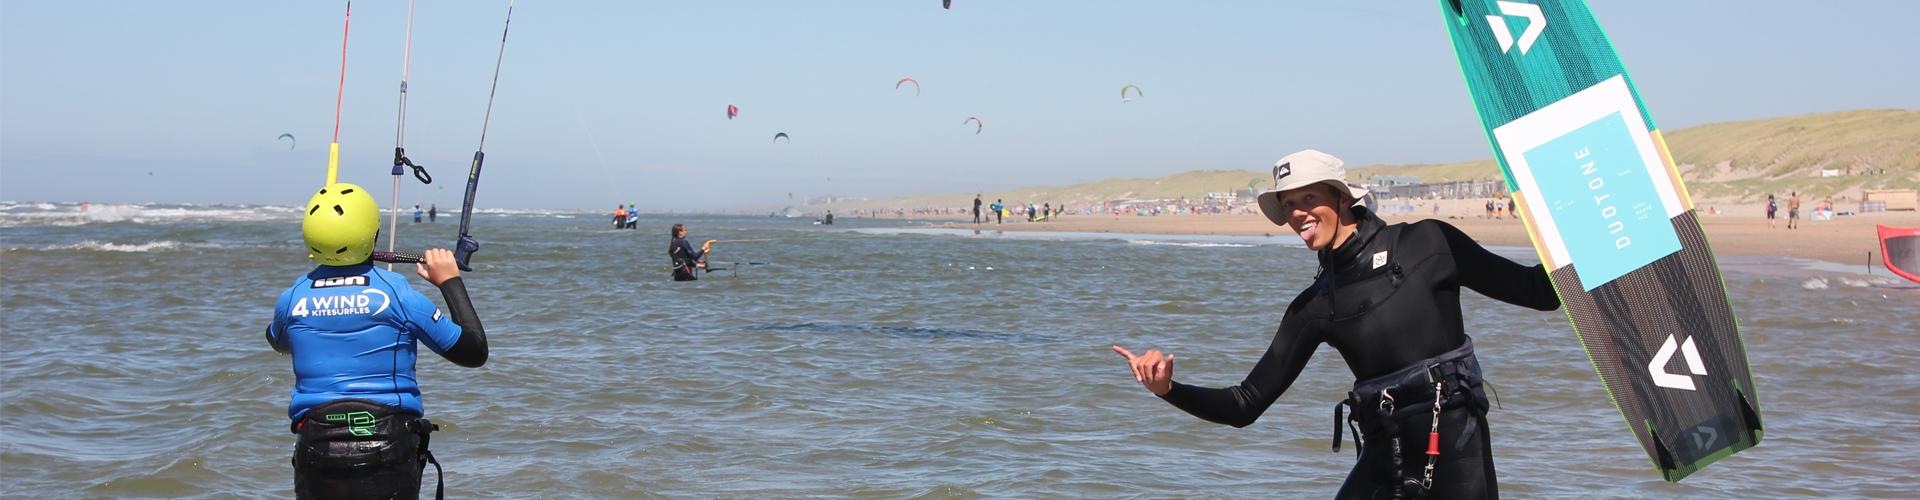 complete cursus kitesurfen